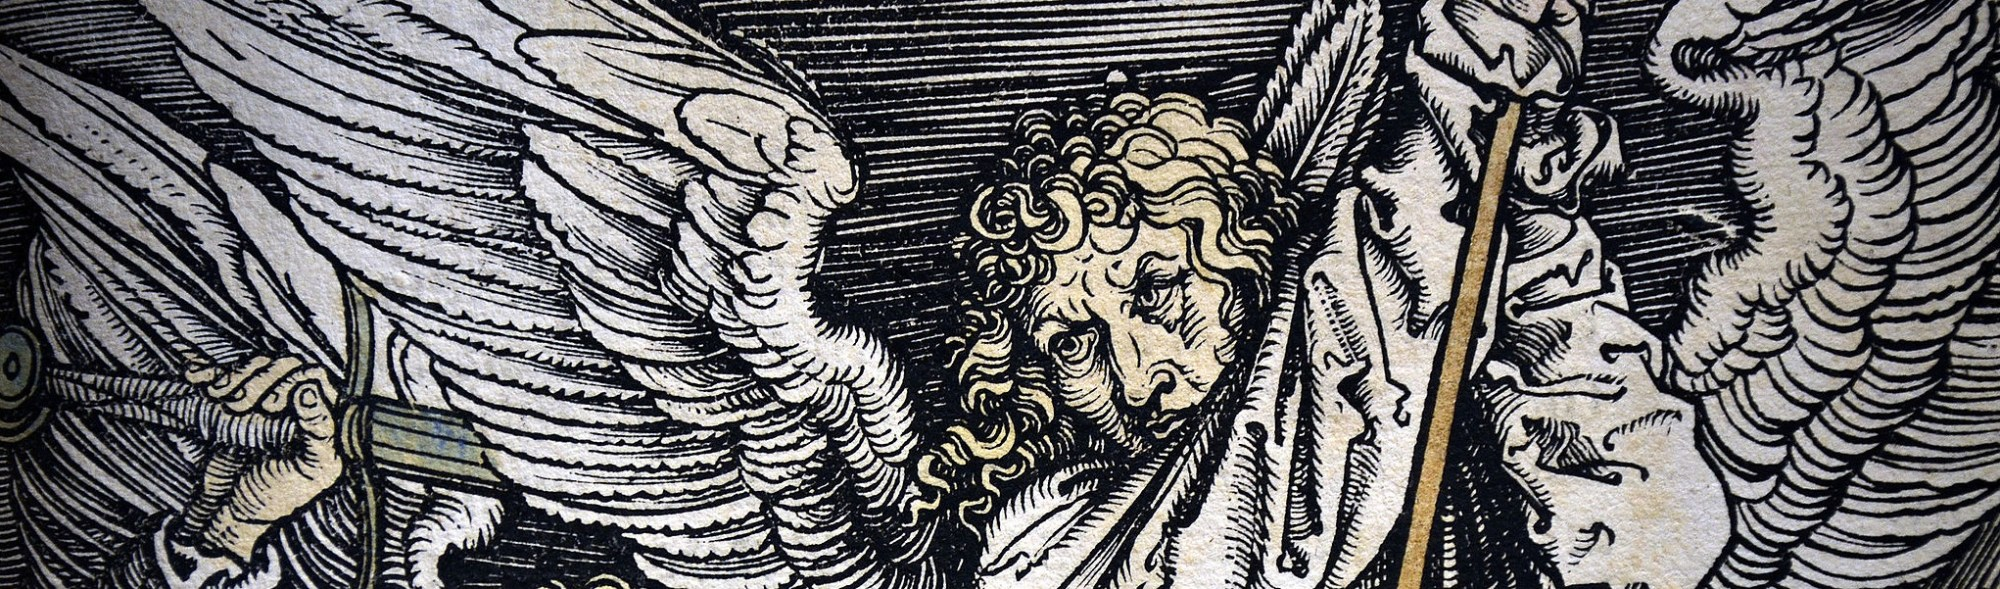 Dürer_Apocalypse_cropped